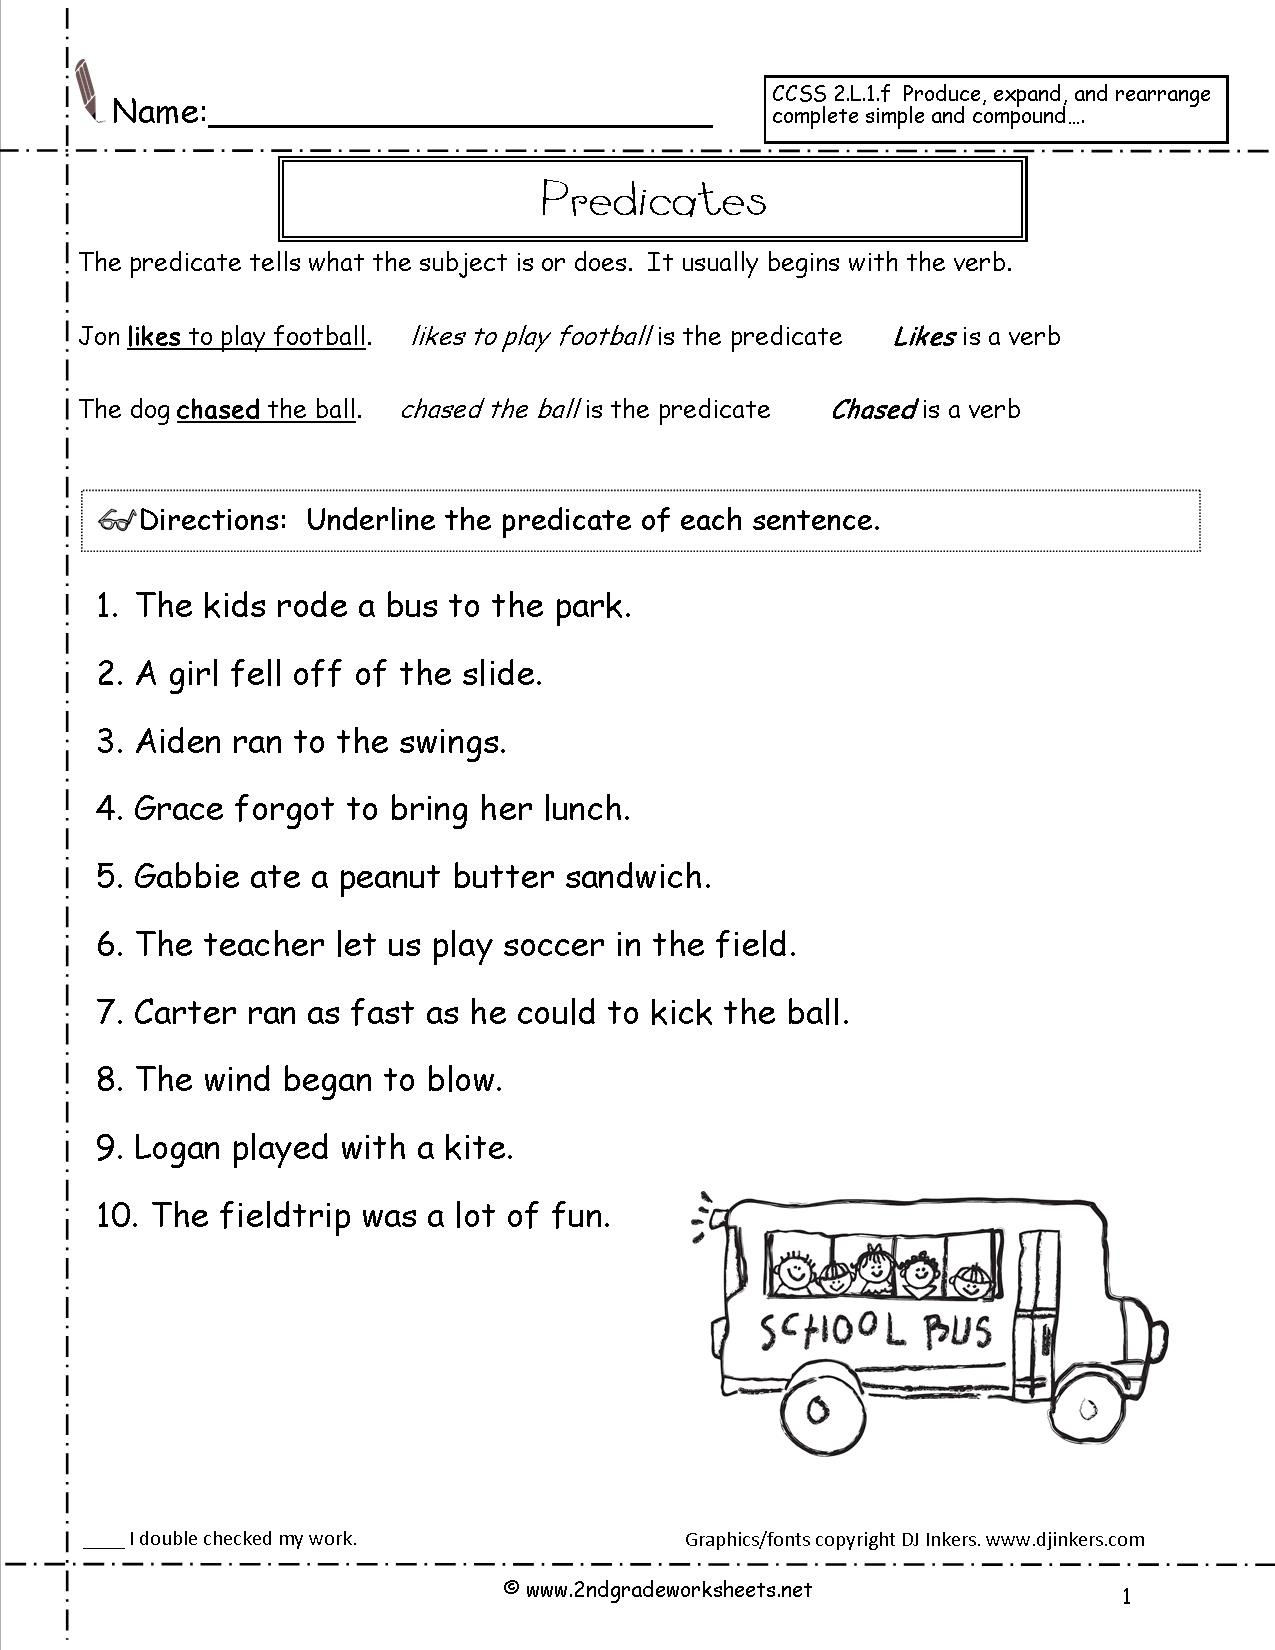 Second Grade Sentences Worksheets, Ccss 2.l.1.f Worksheets. - Free Printable Sentence Correction Worksheets